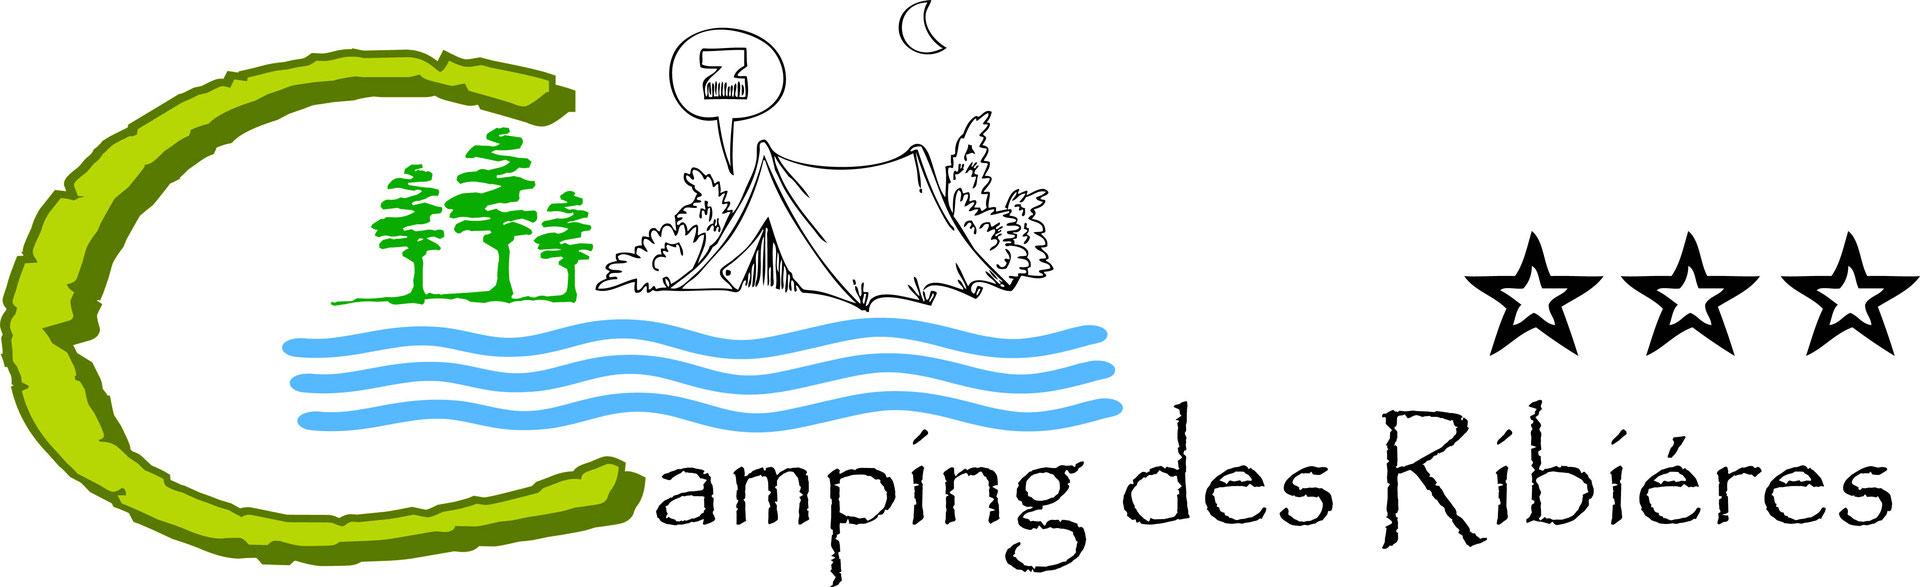 (c) Campingdesribieres.fr